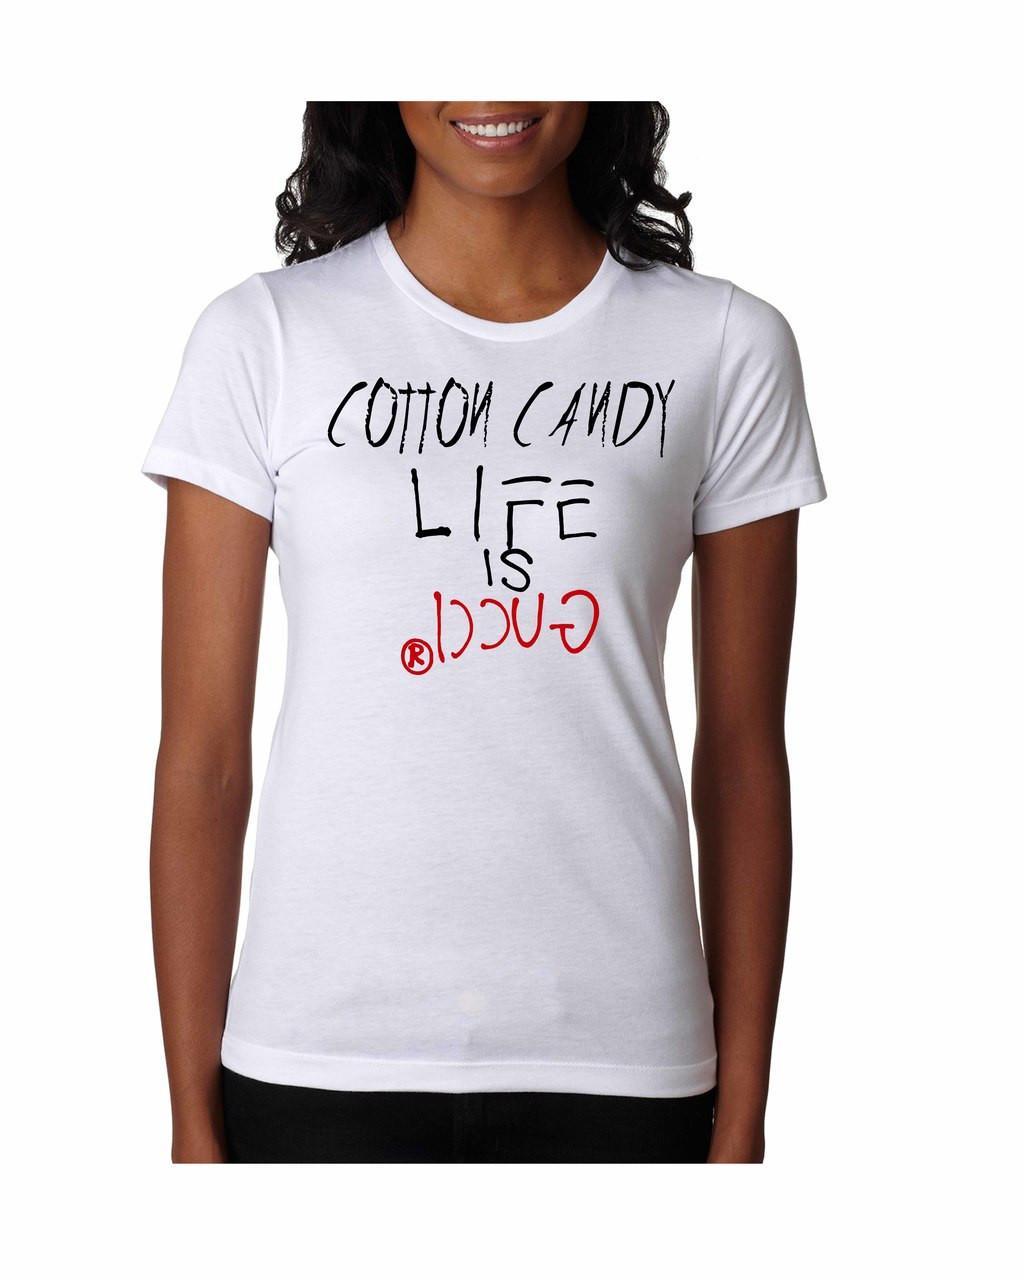 ea466d0882fe Cotton Candy Life is Gucci Girl Tshirt Ladies Tshirt. Price   19.00. Image 1